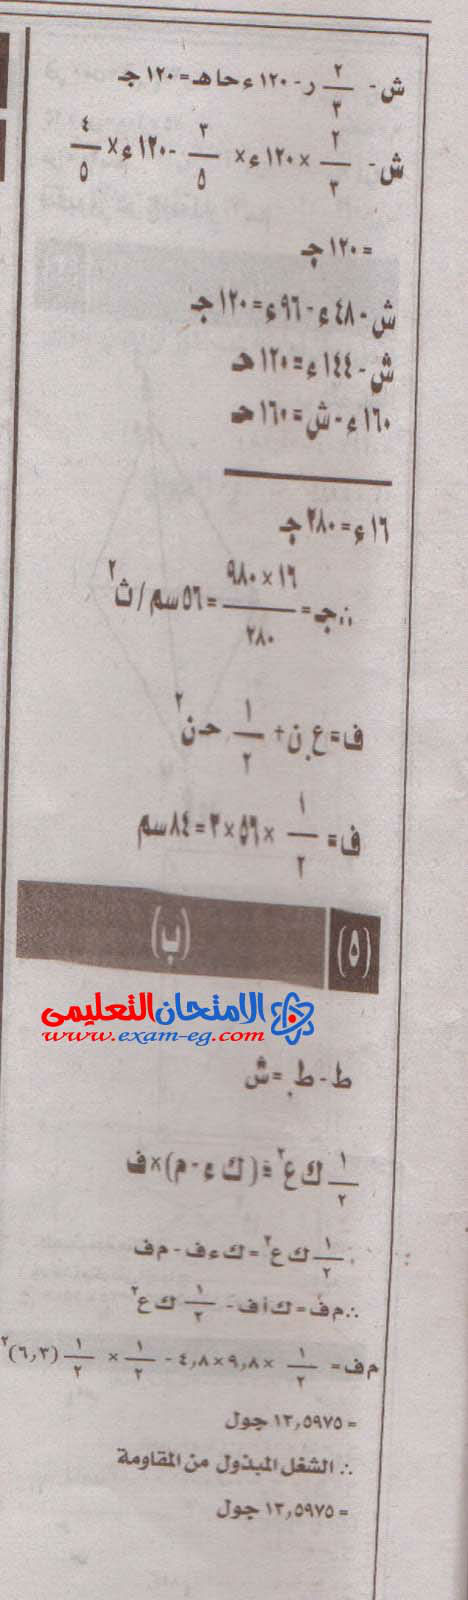 exam-eg.com_1429845072576.jpg